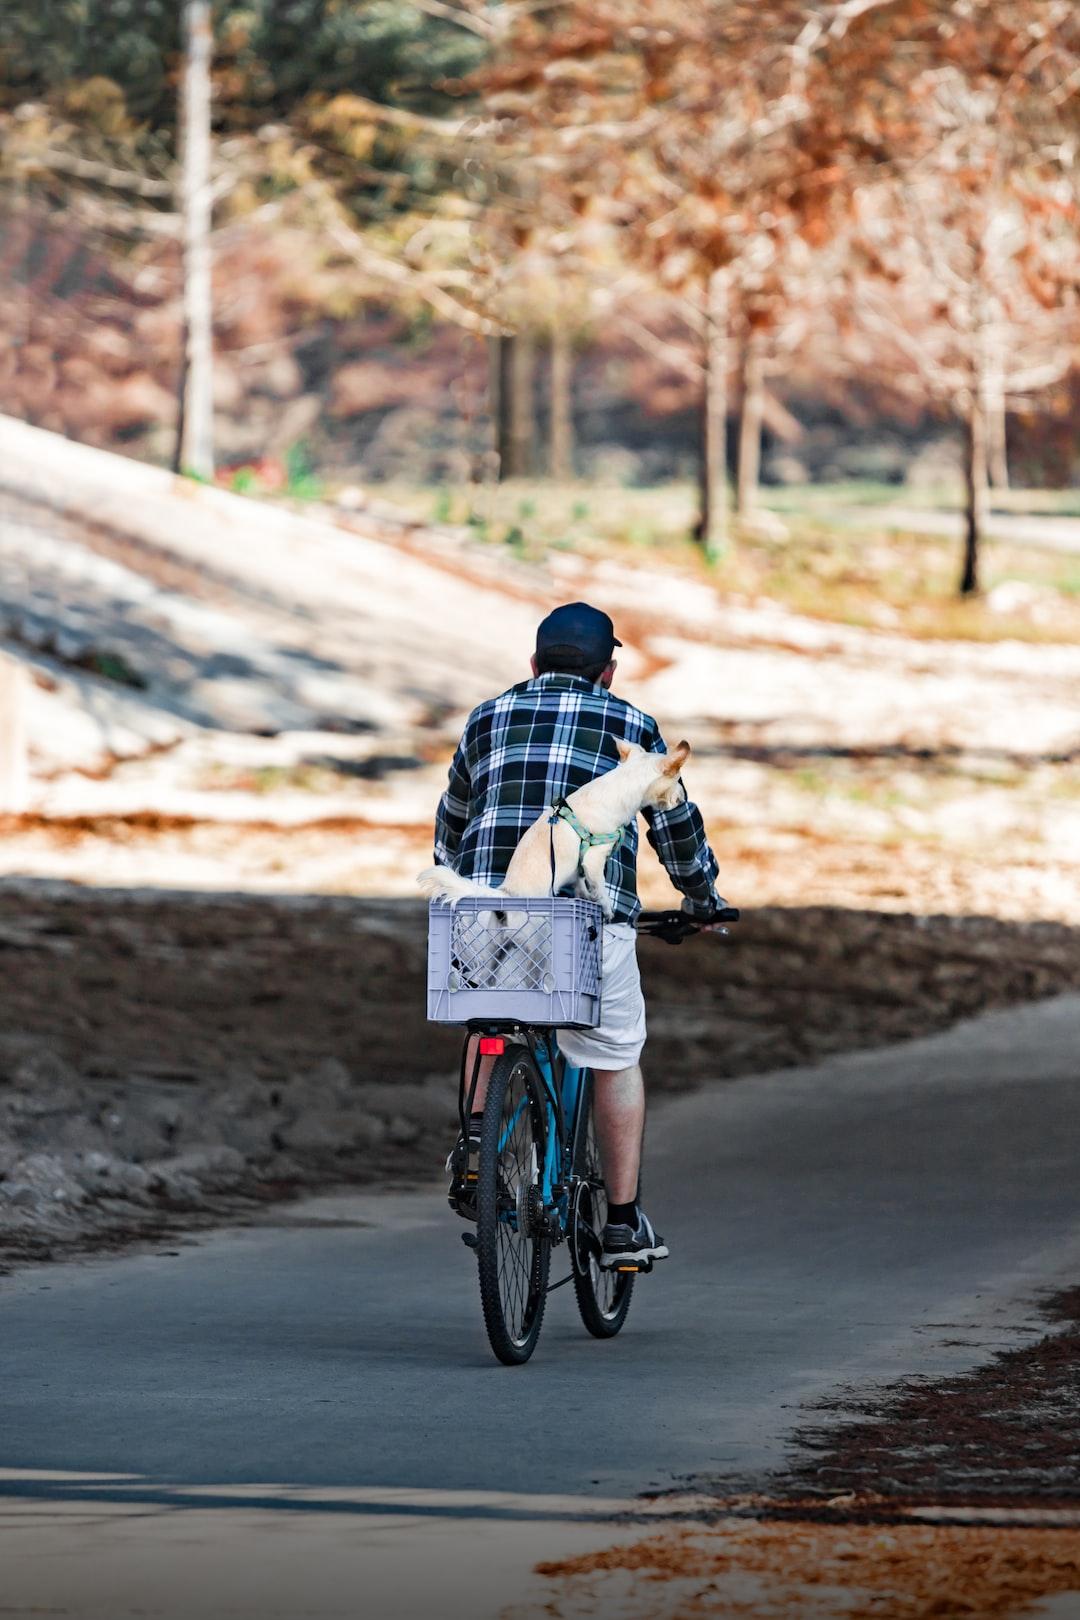 Man riding bike with dog in basket, Buffalo Bayou Houston, TX